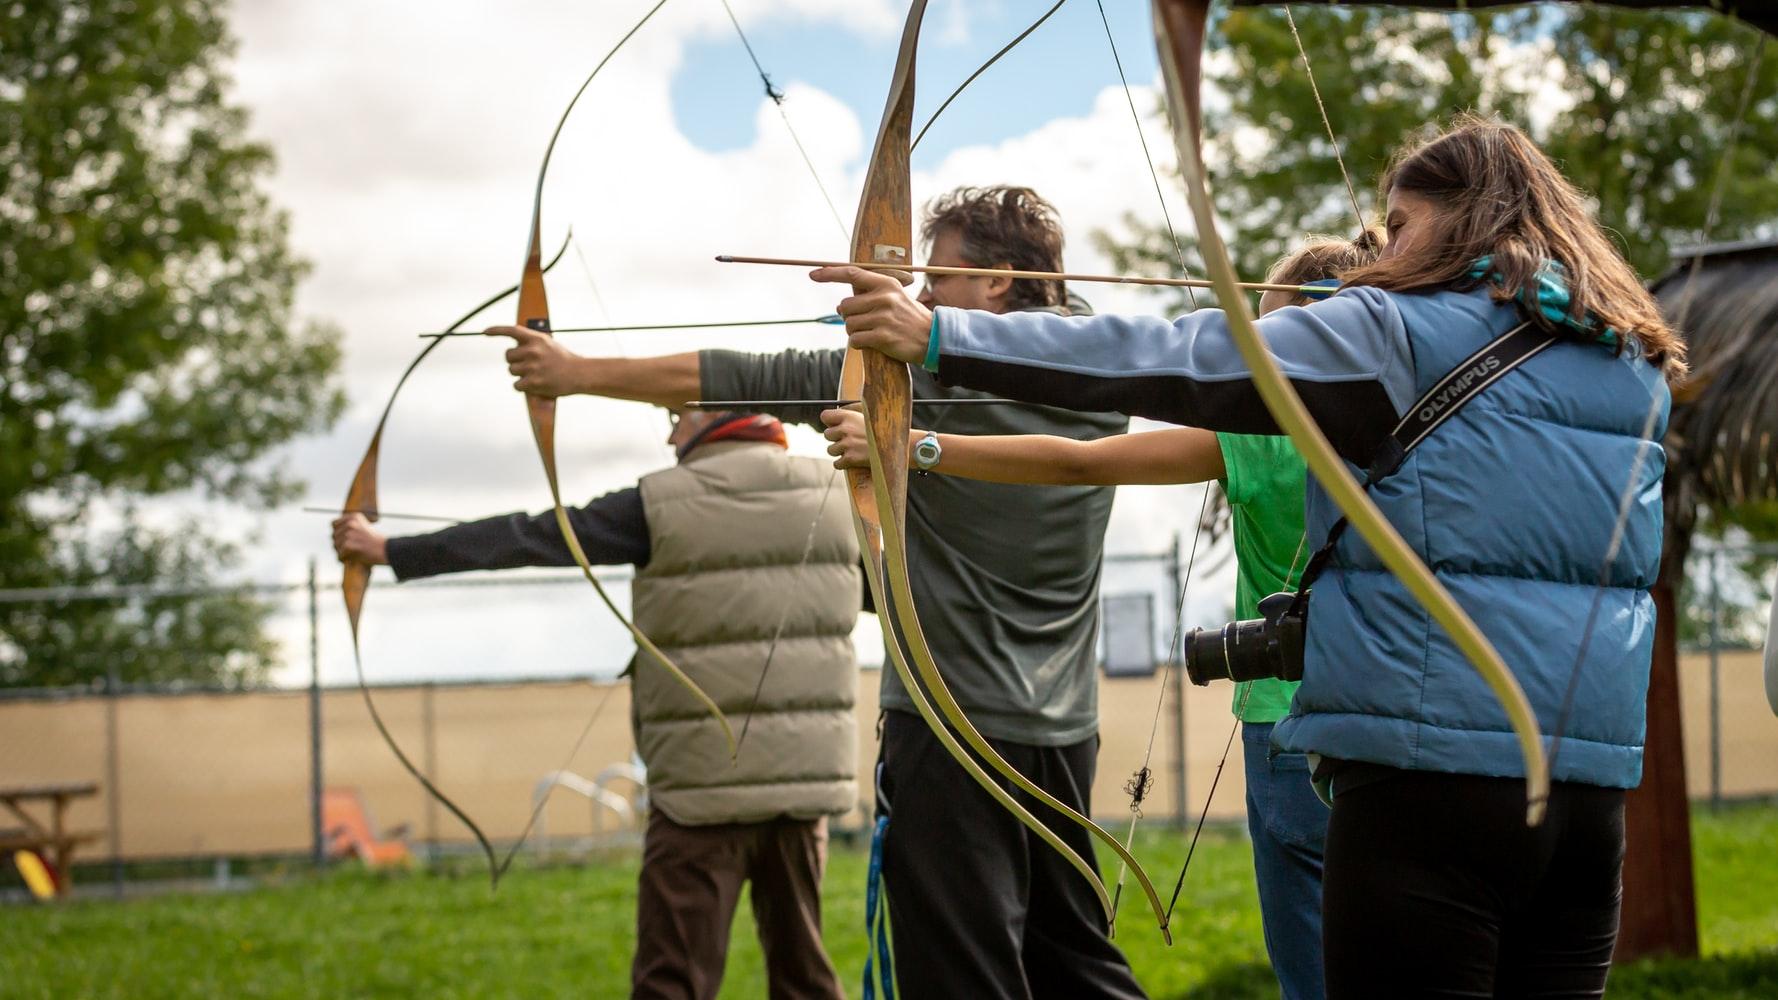 Picking up Archery hobby